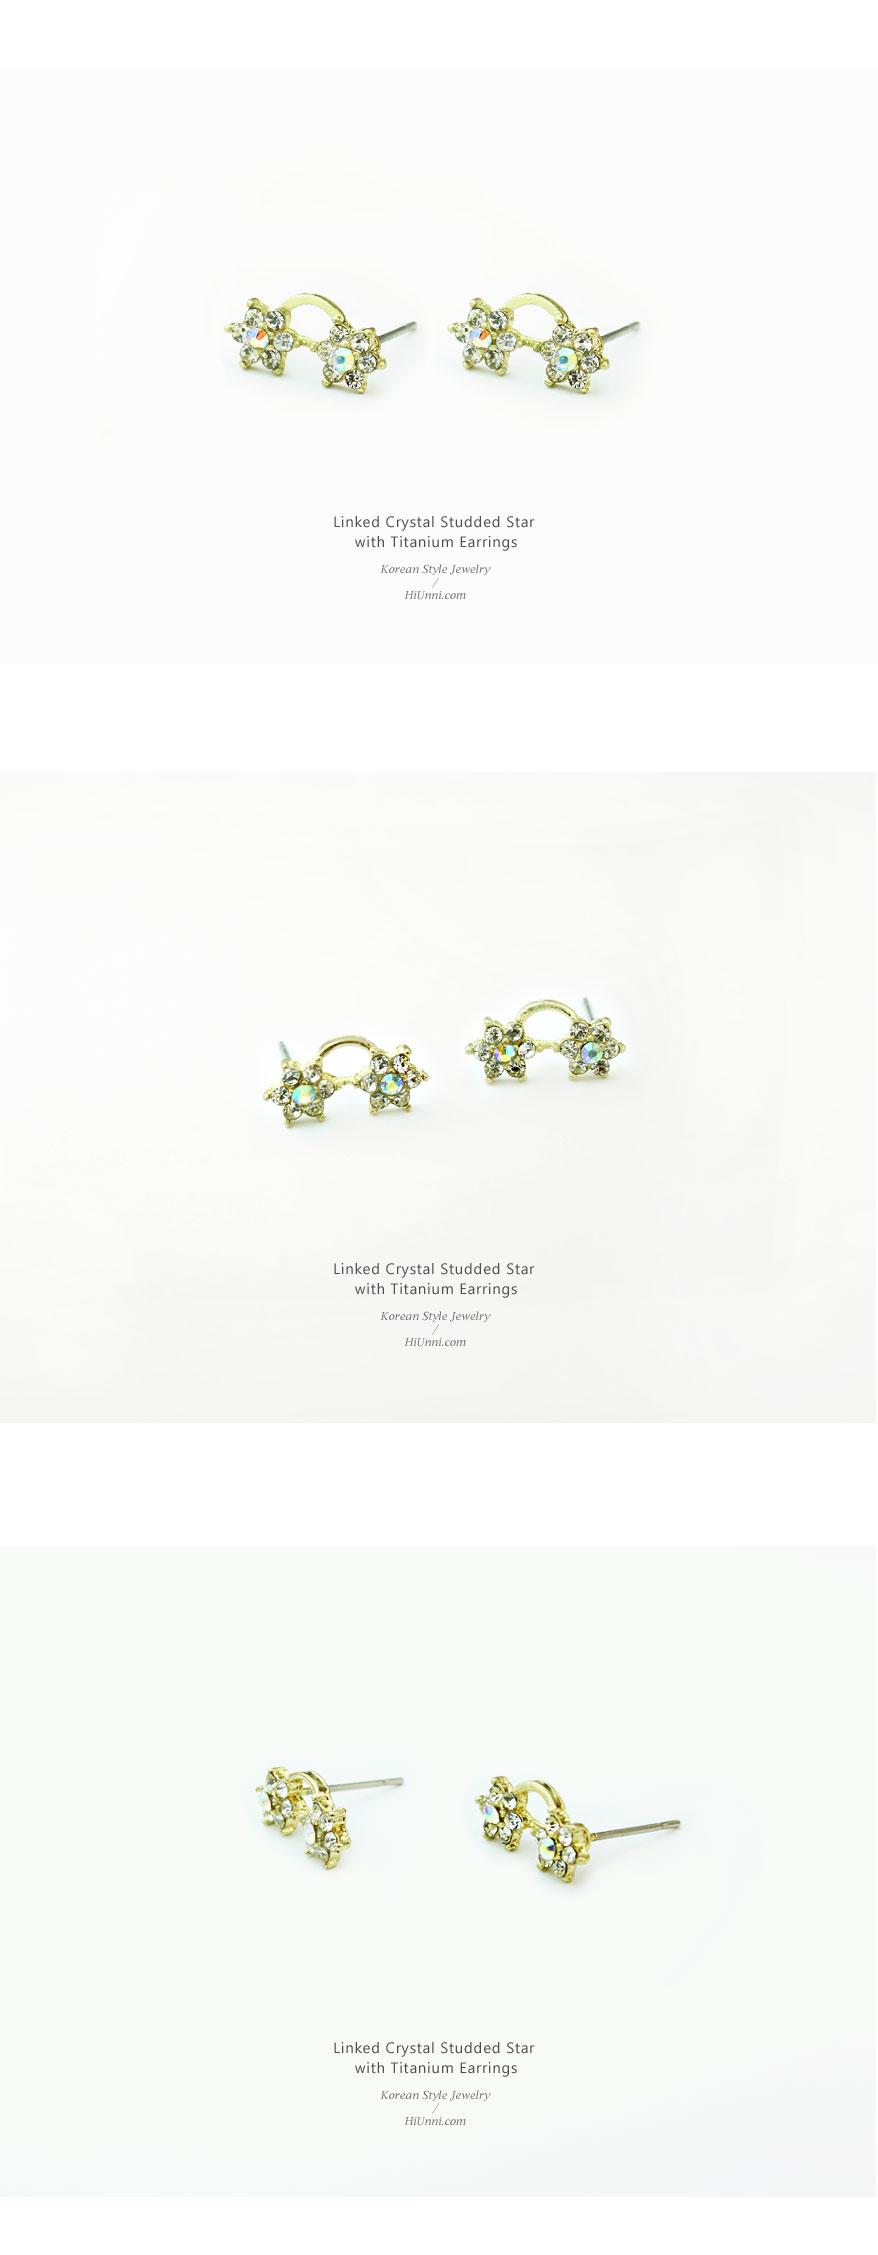 accessories_ear_stud_earrings_korean_asian_style_jewelry_Nickel-Free_Titanium_star_ab_color_Crystal_5